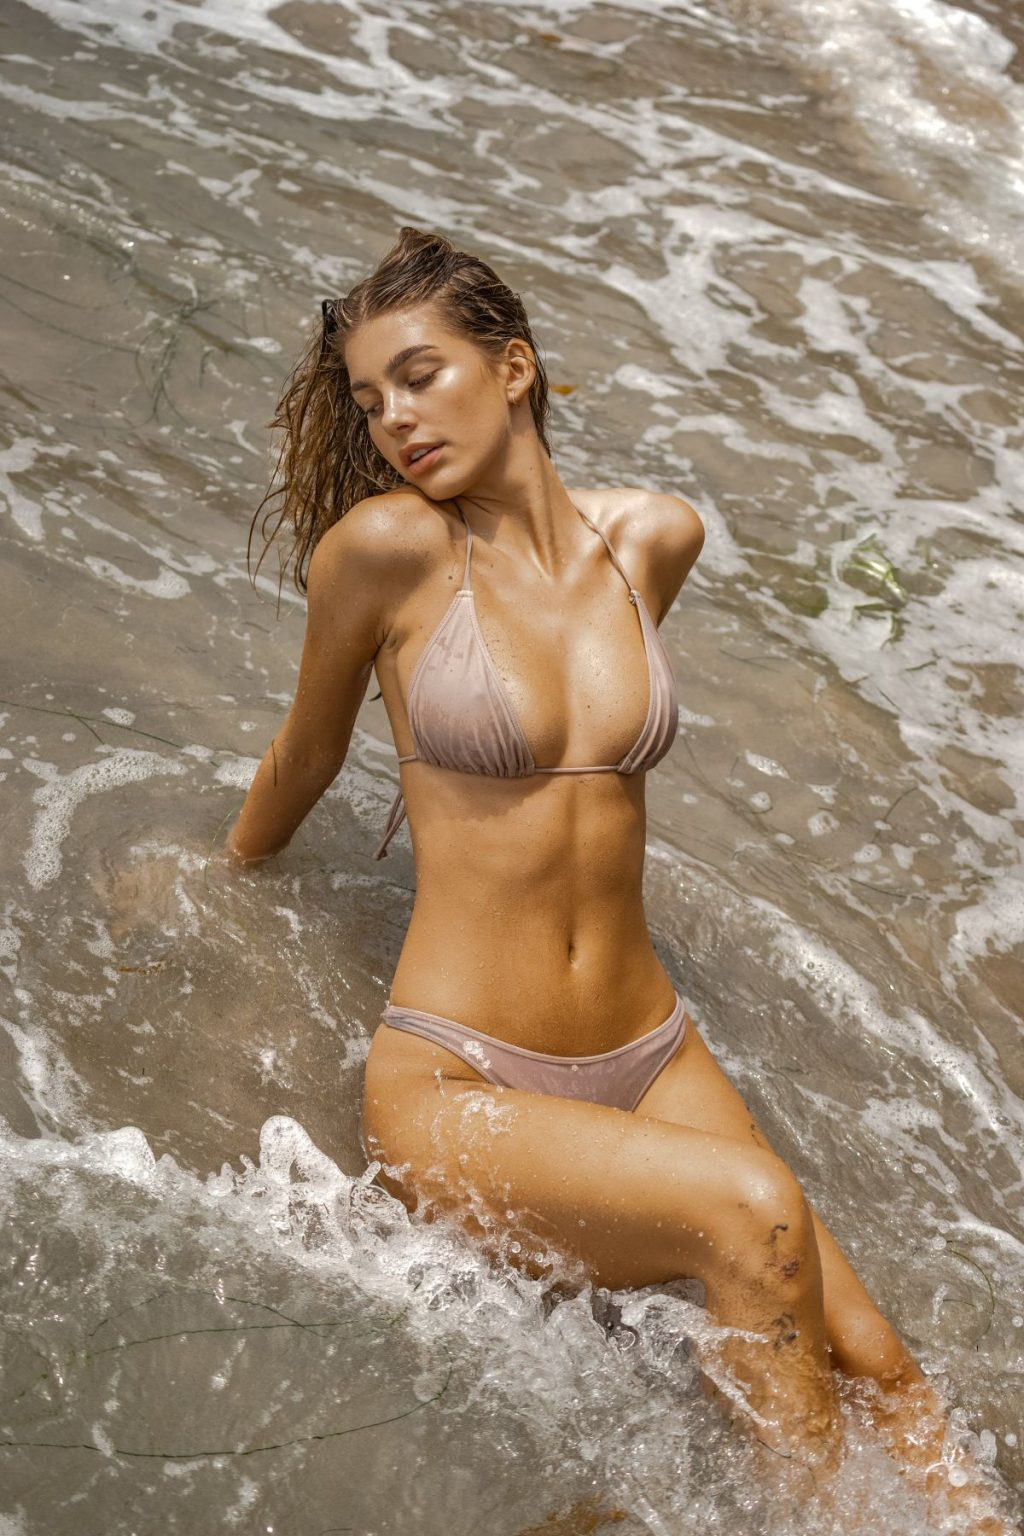 Camila Morrone Topless